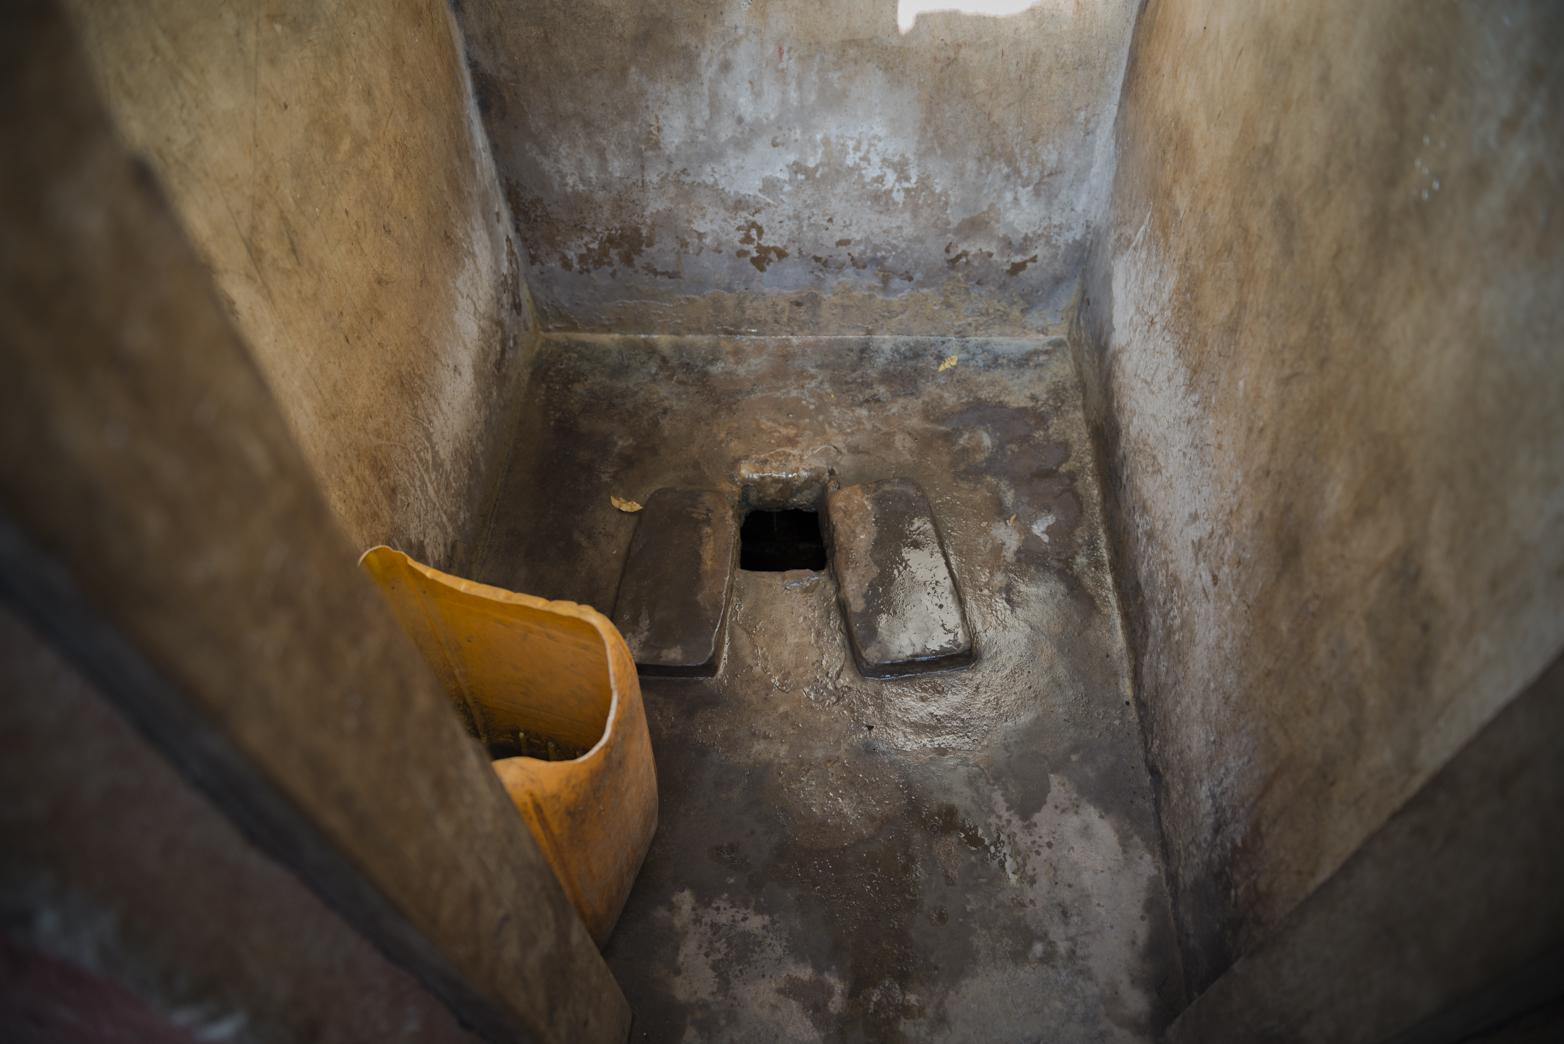 Drop hole toilet